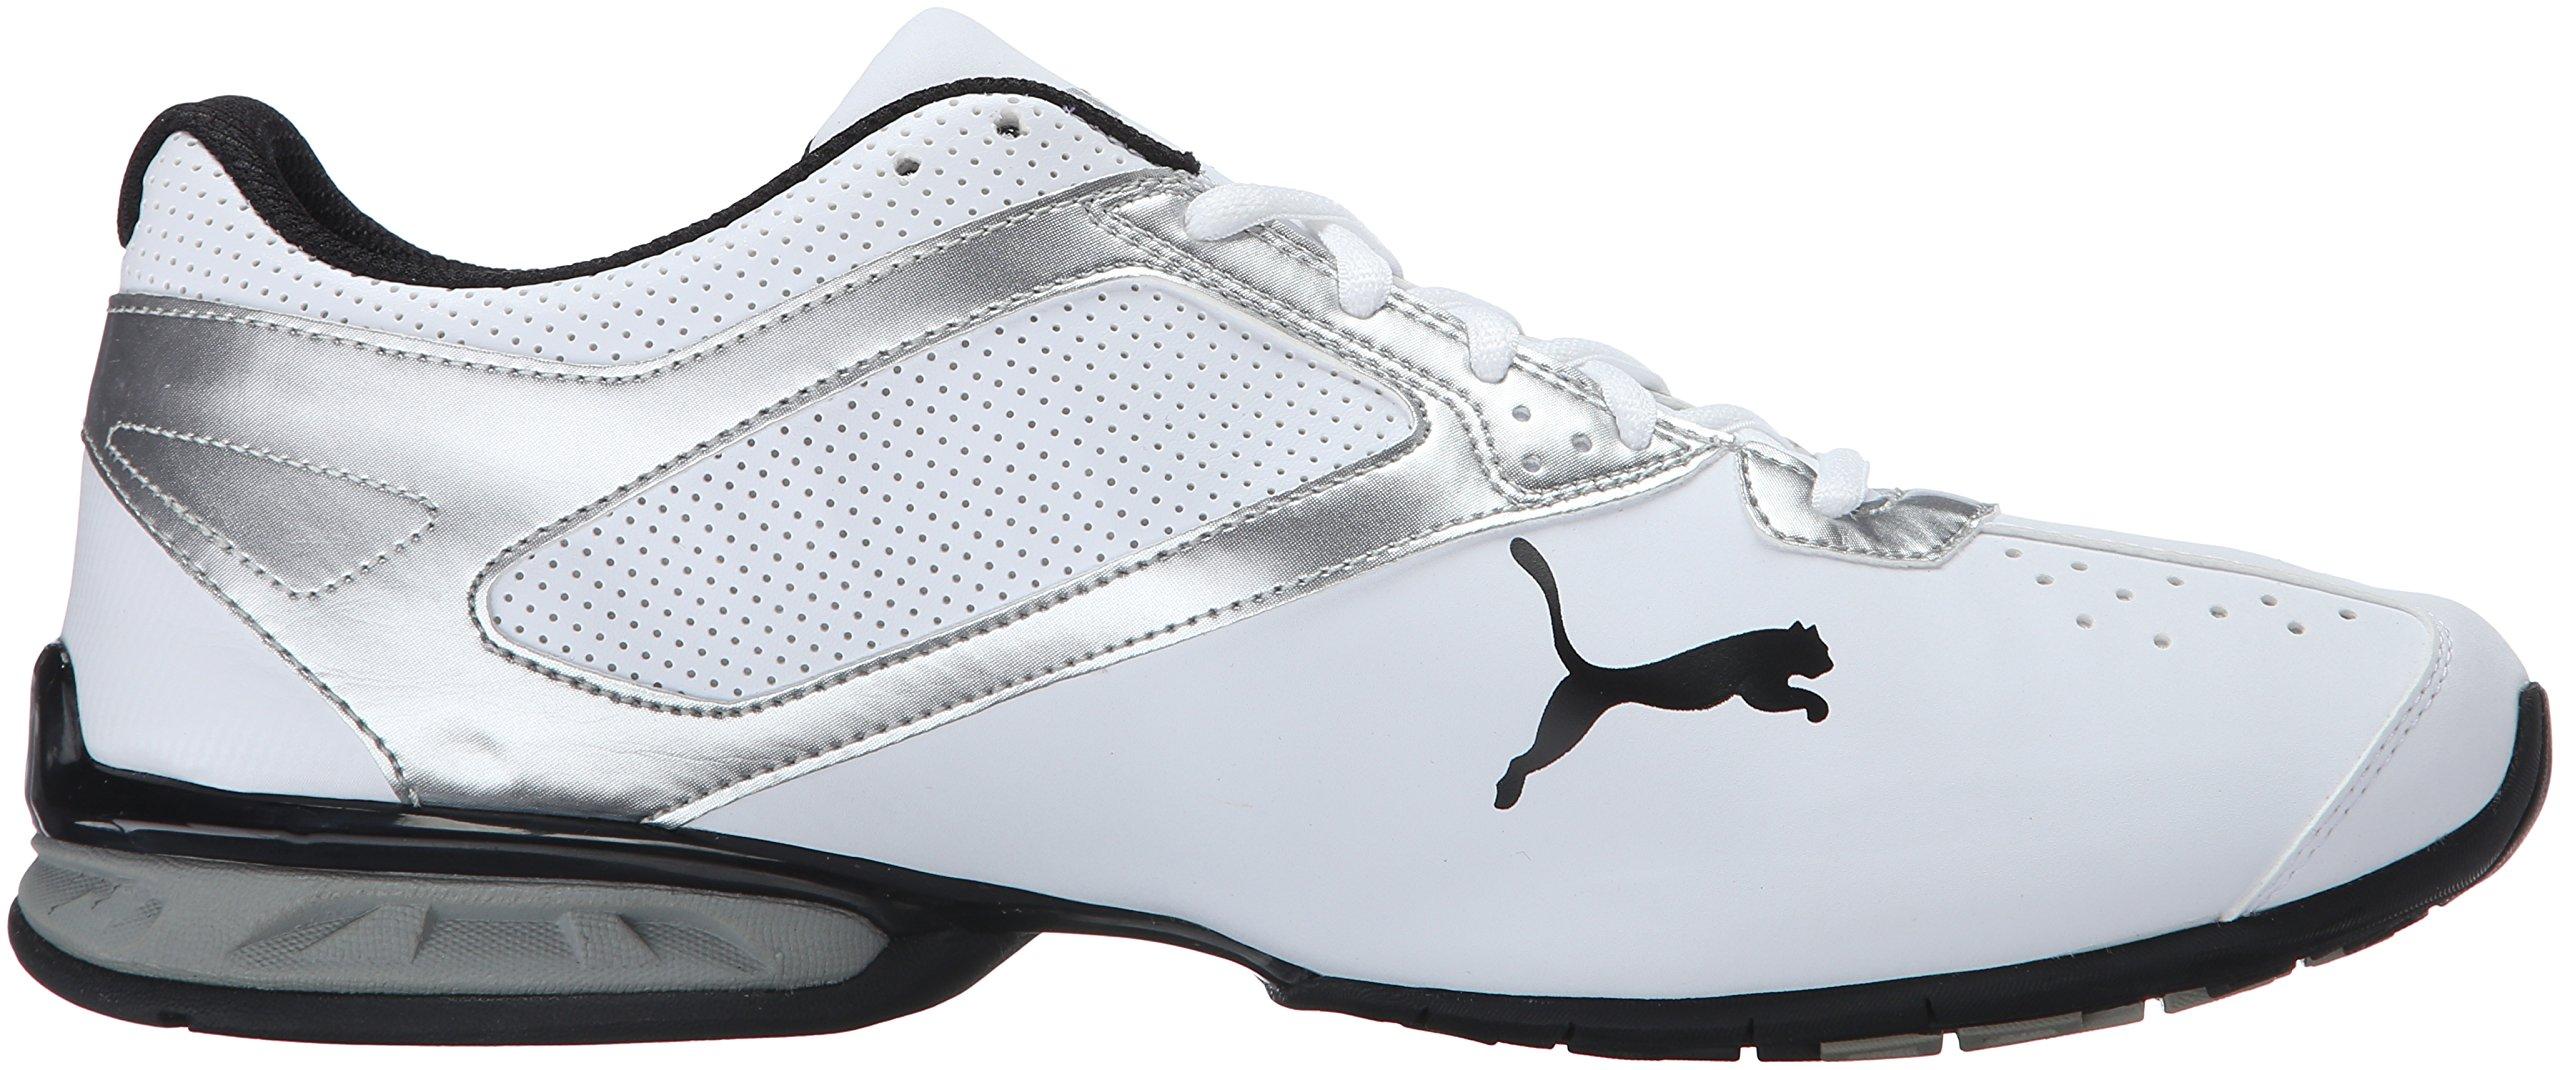 PUMA Men's Tazon 6 FM Puma White/ Puma Silver Running Shoe - 7.5 D(M) US by PUMA (Image #7)